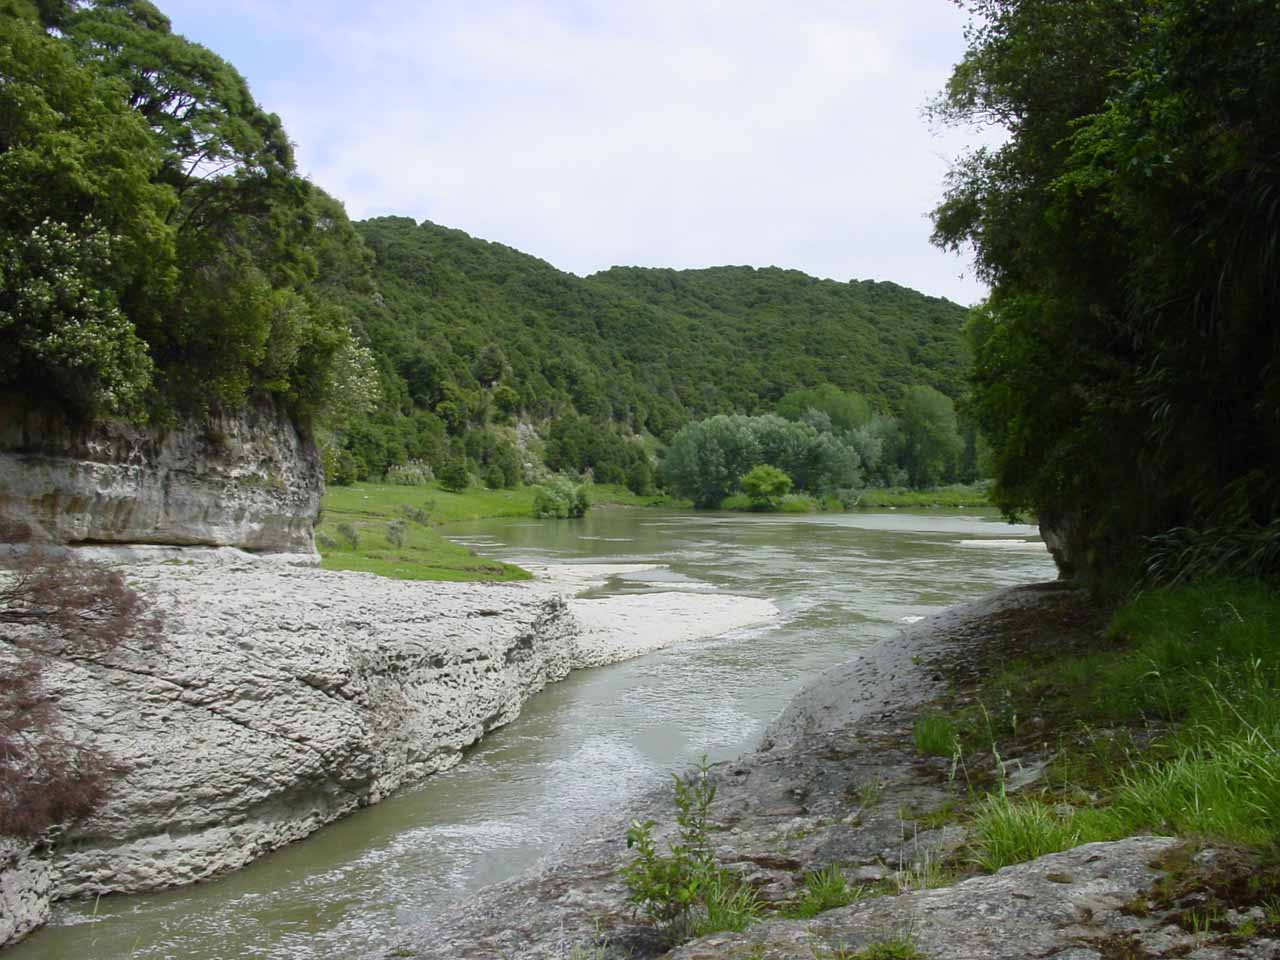 Looking downstream from Te Reinga Falls